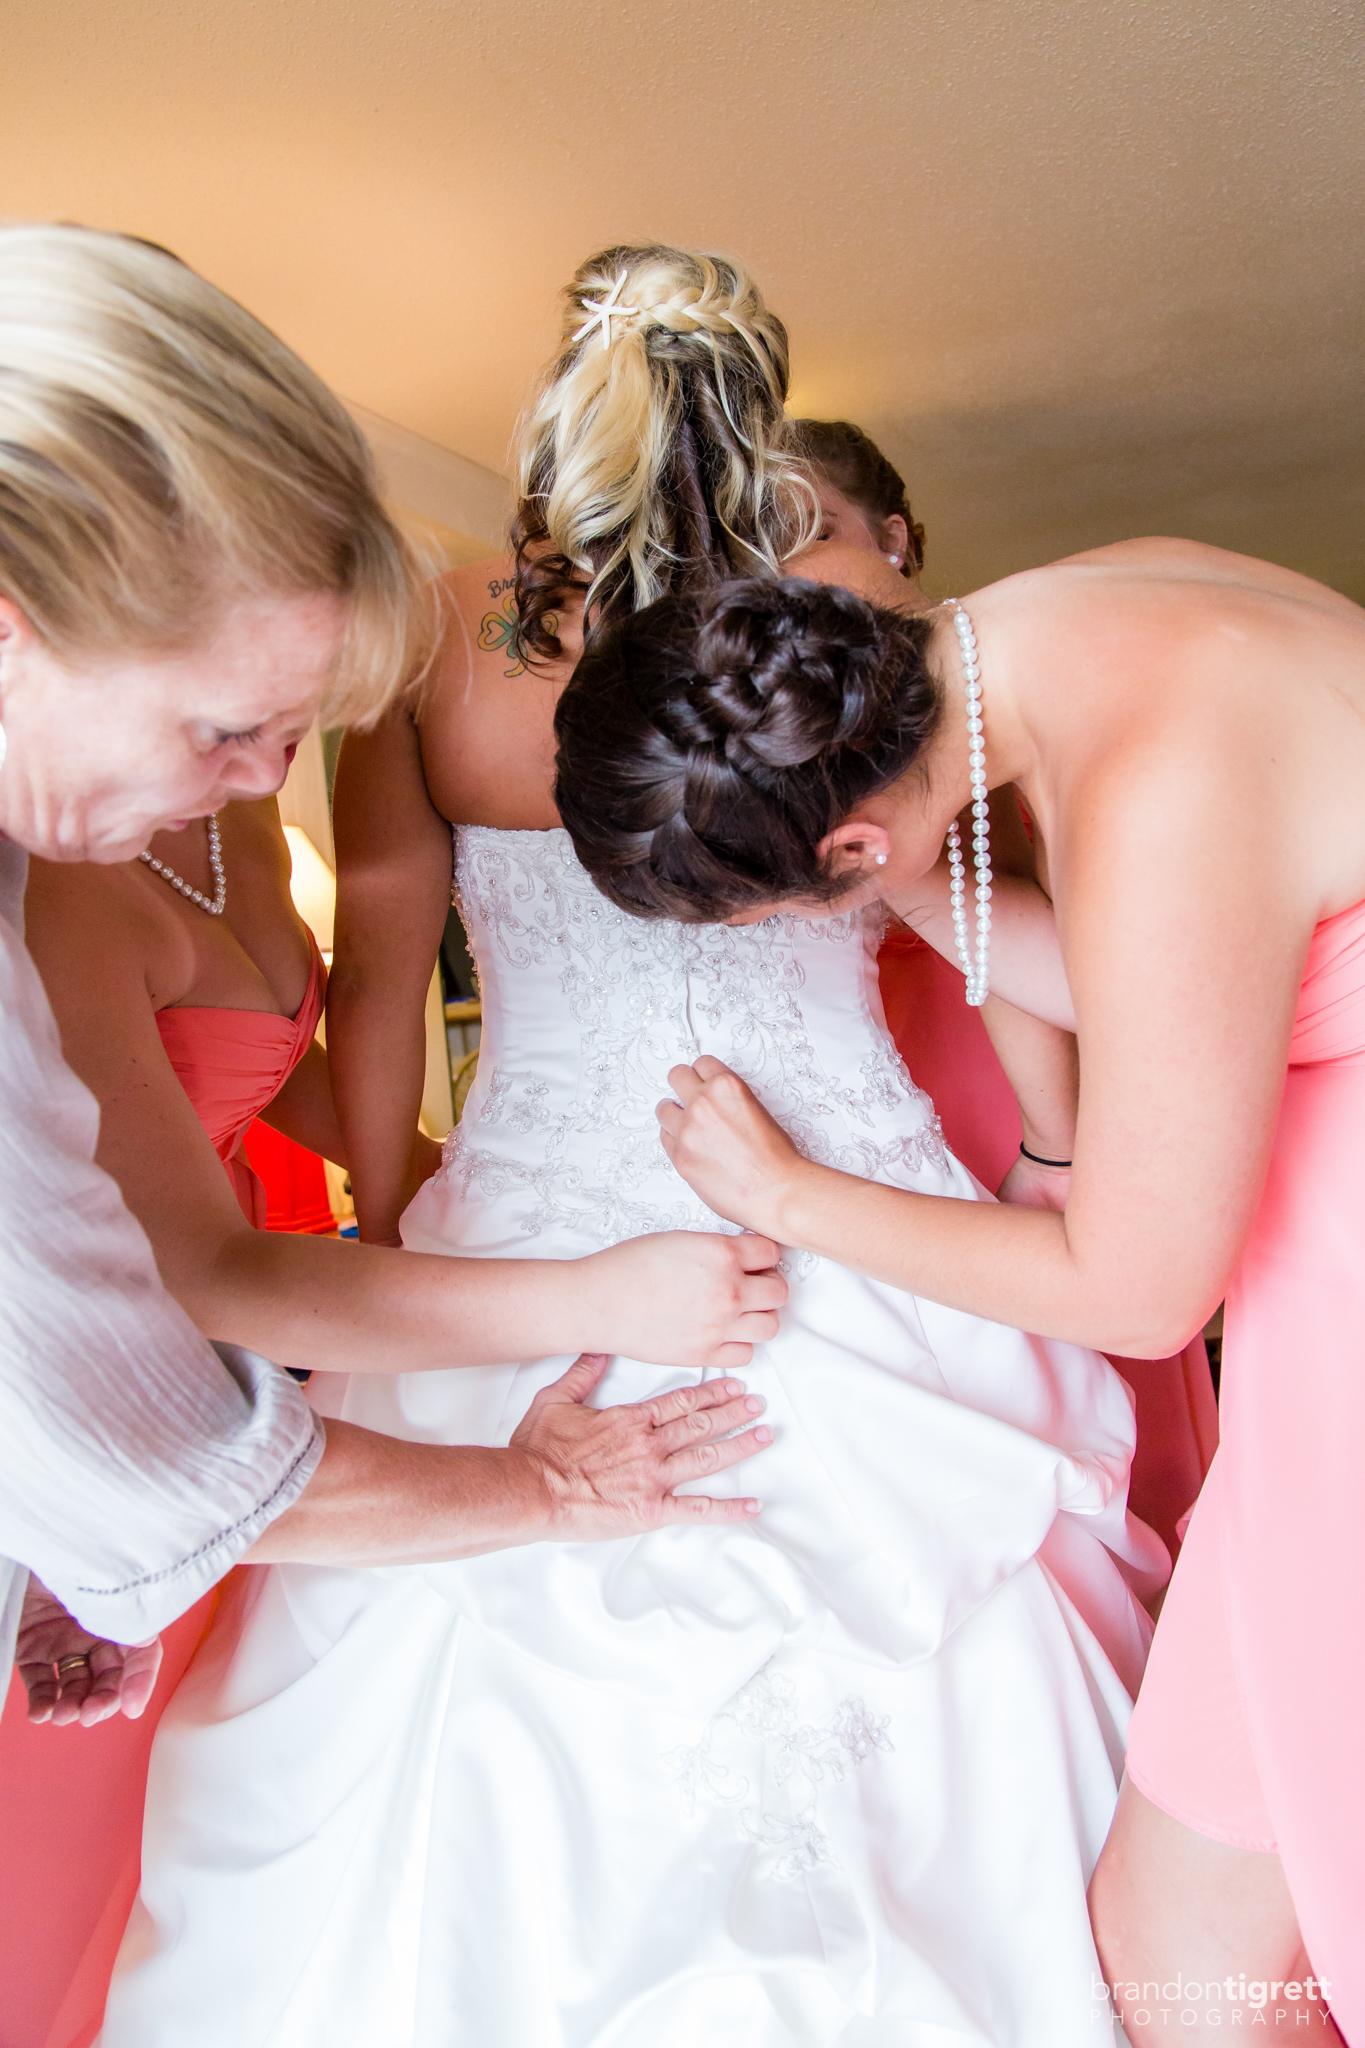 Beach Wedding Getting Ready Photos - Bridesmaids button brides gown